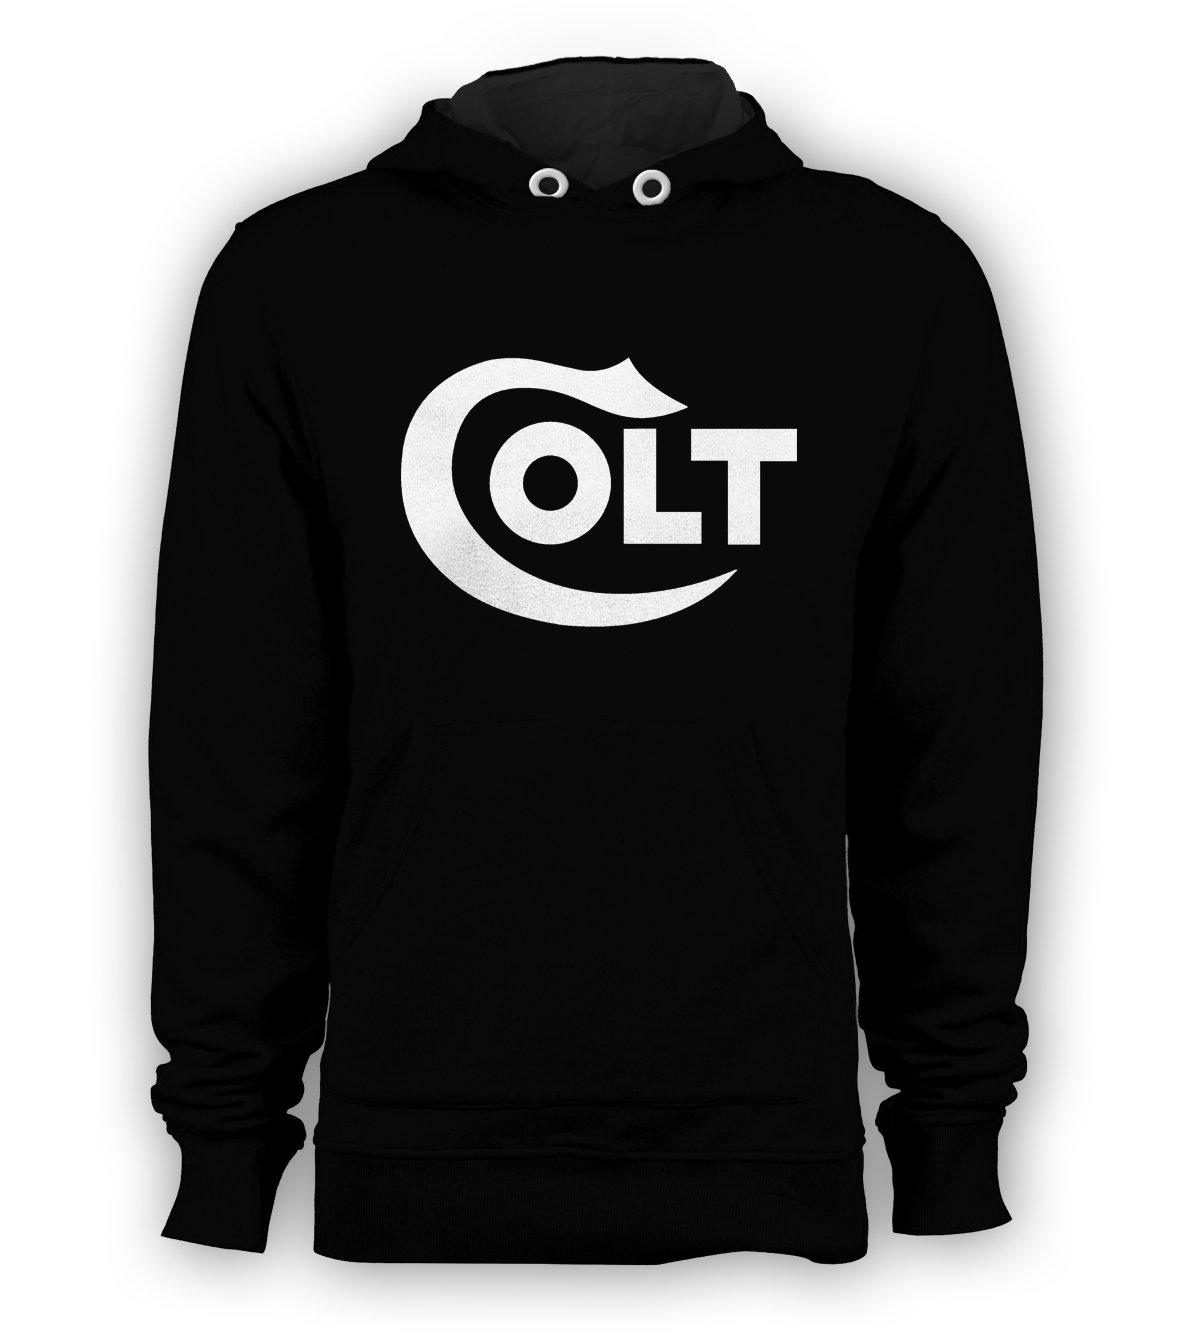 Colt Firearms Rifle Gun Pullover Hoodie Men Sweatshirts Size S to 3XL New Black